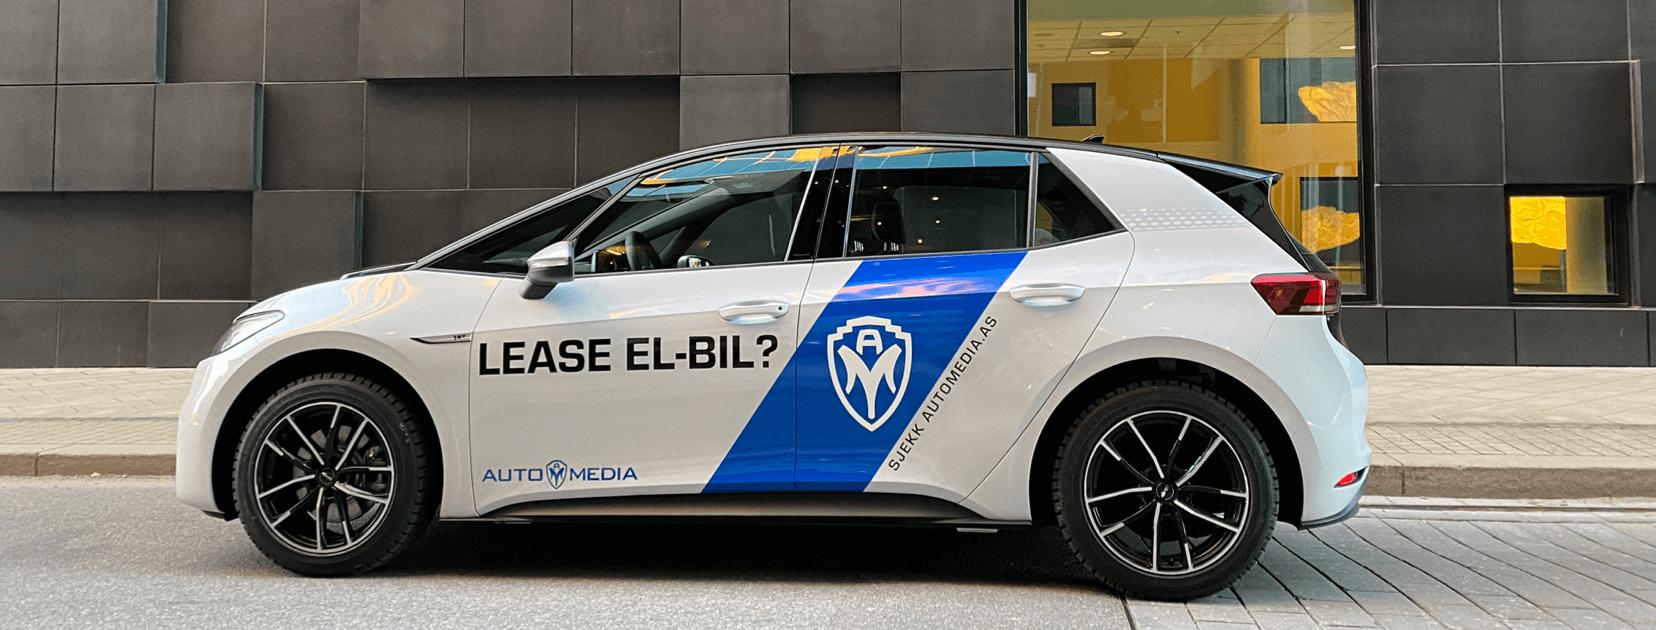 Reklame på bil hos Automedia